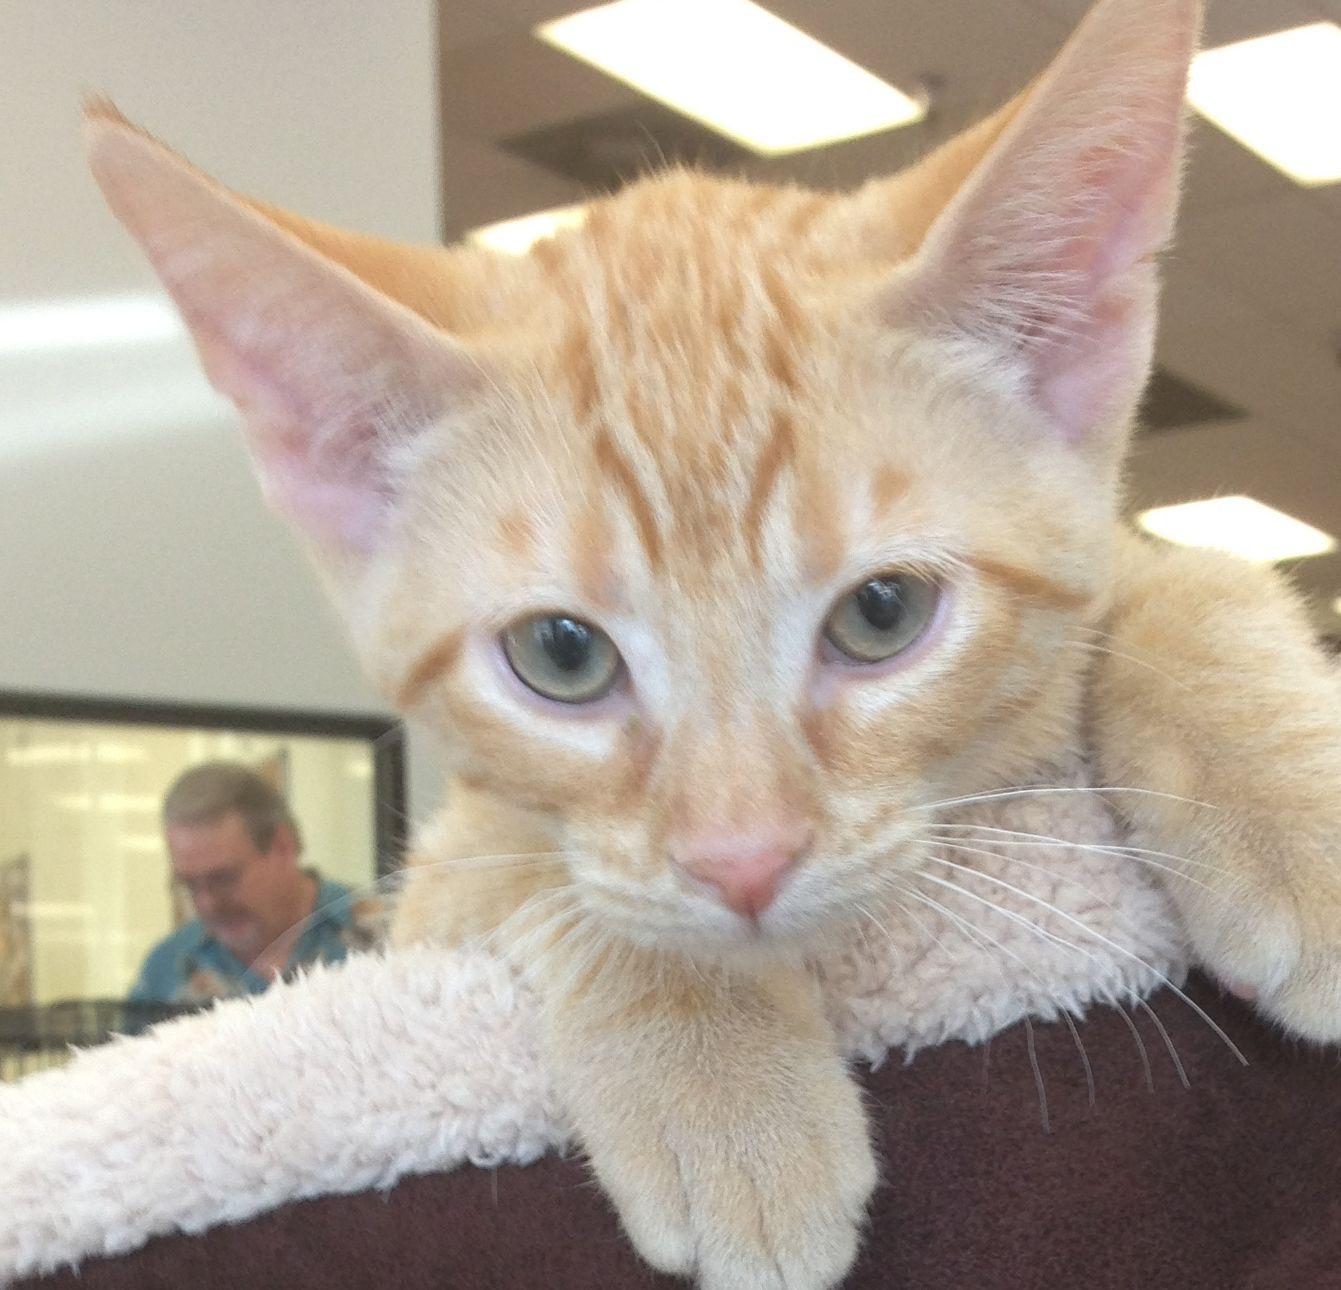 Bailey Is A Spunky 4 Month Old Short Haired Orange Tabby Kitten He Is Neutered Vaccinated And Ready Tabby Kitten Orange Animal Welfare League Tabby Kitten